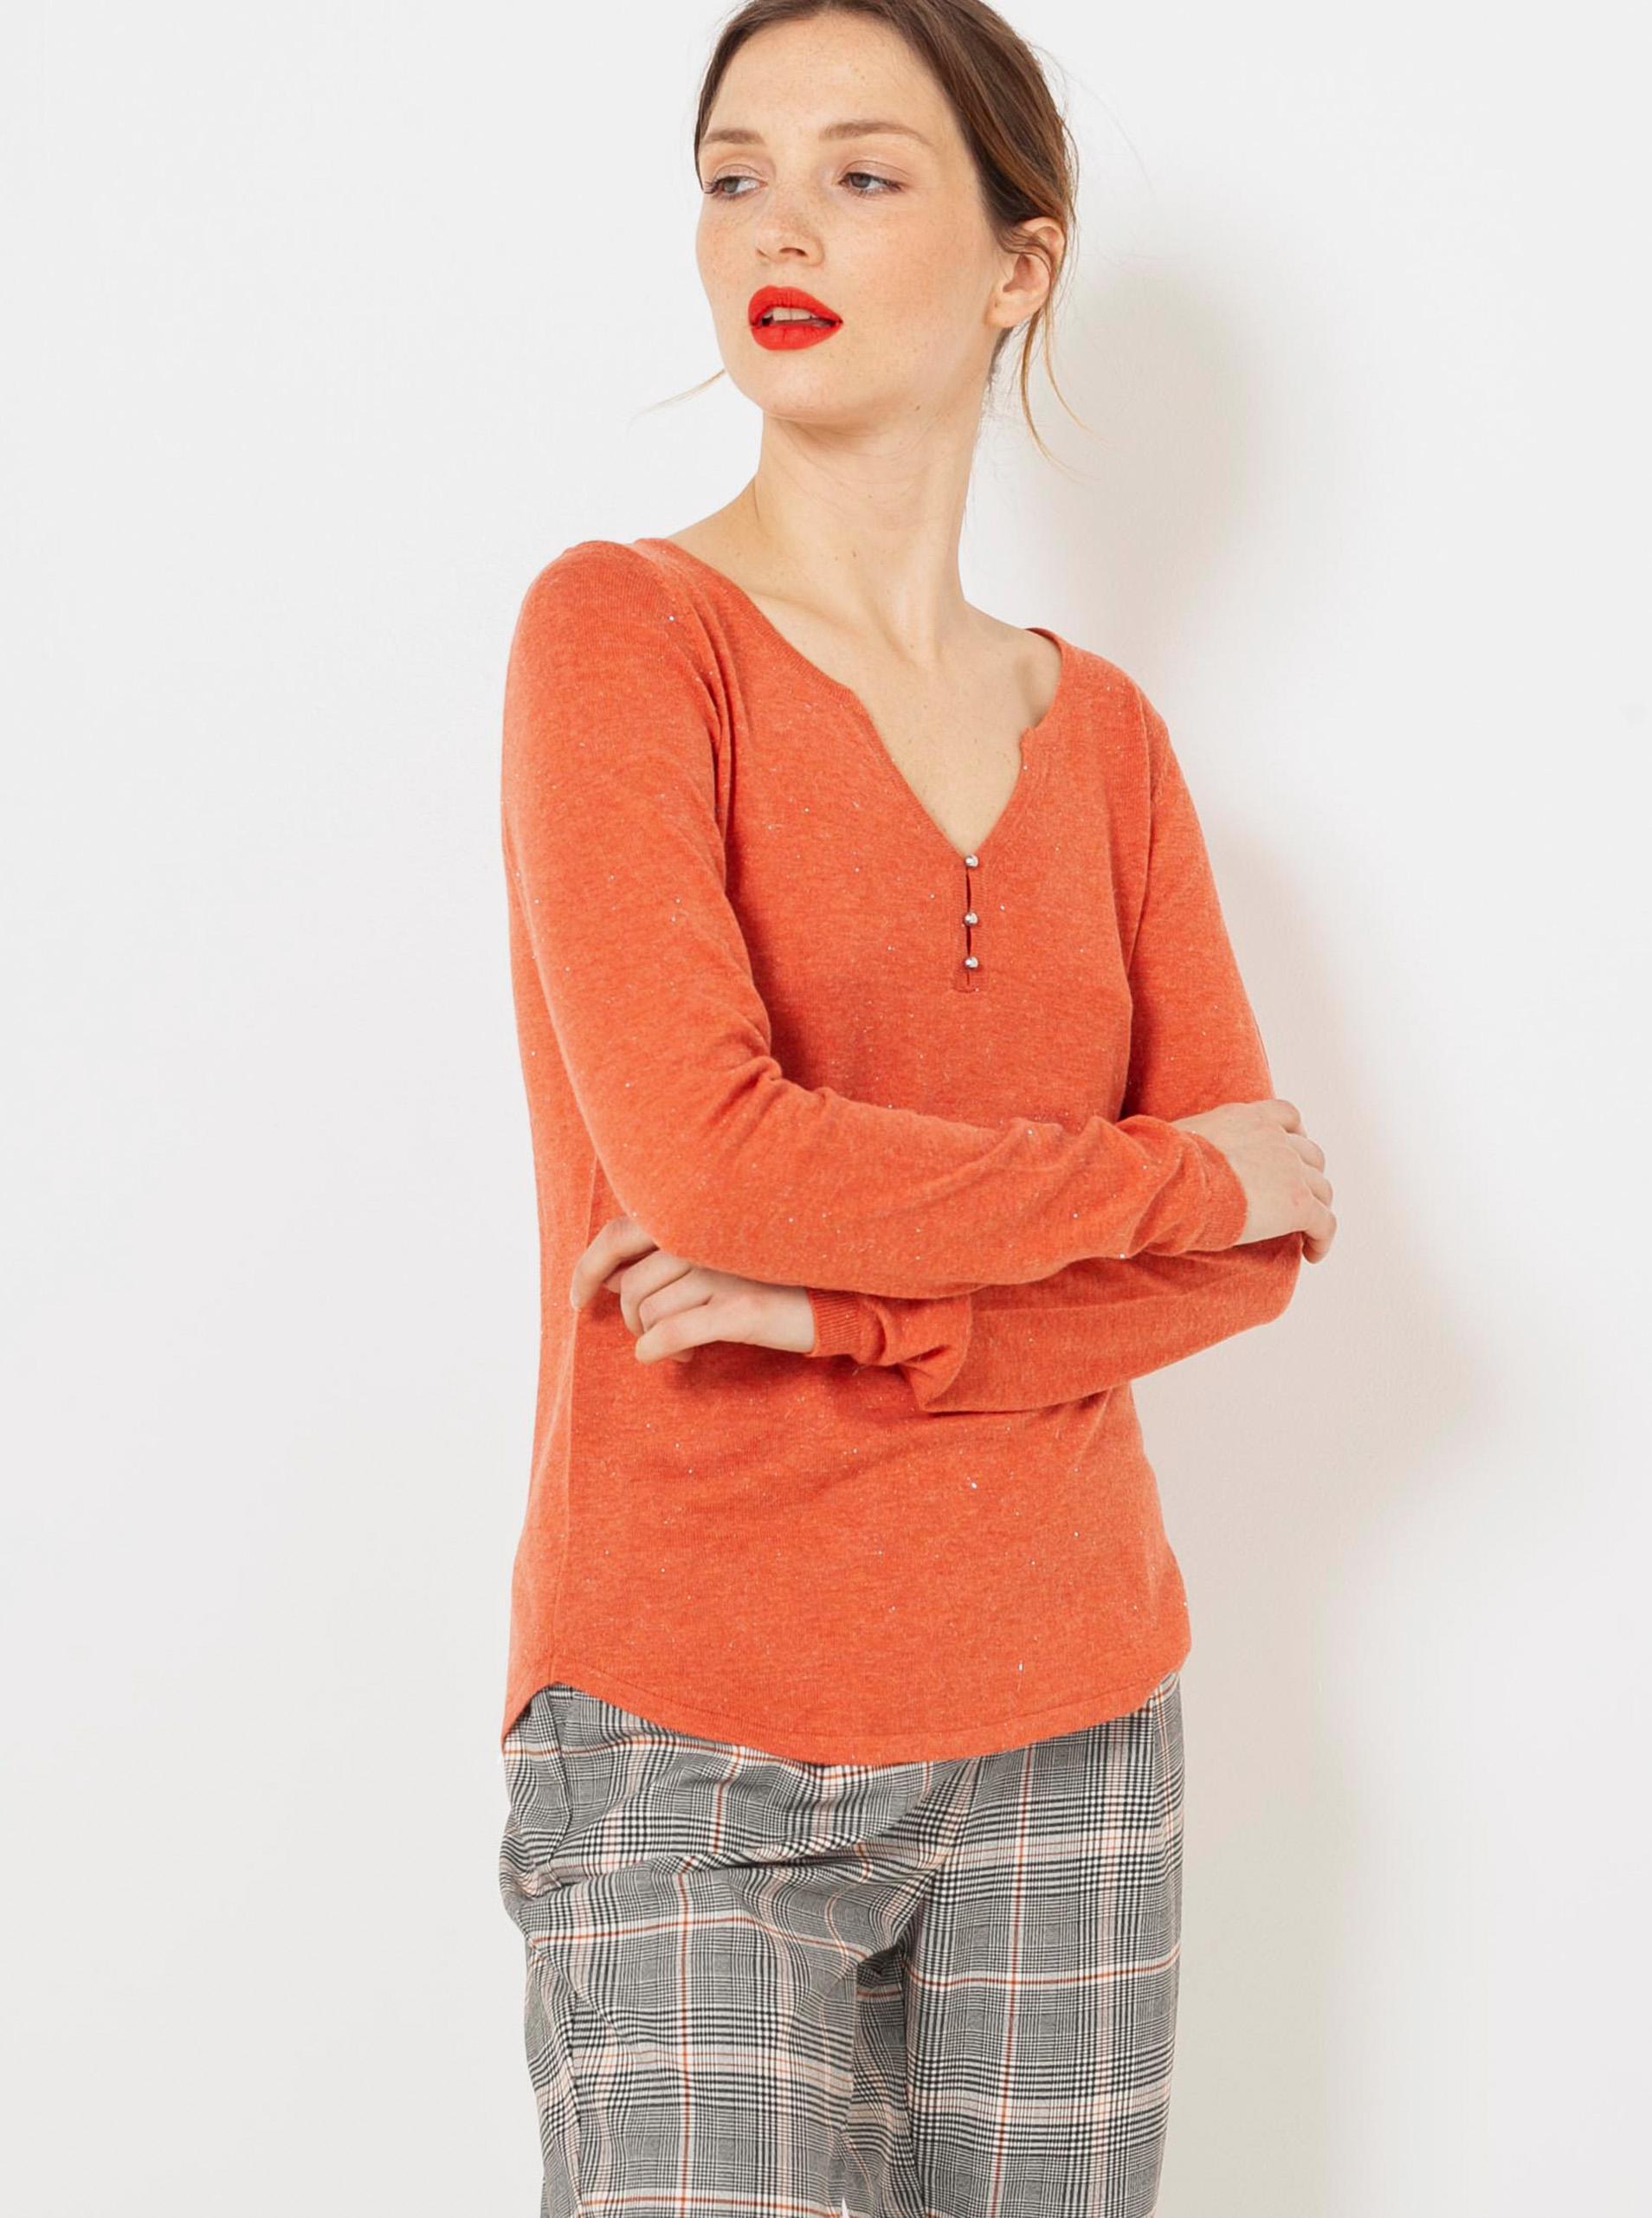 CAMAIEU arancione da donna maglietta